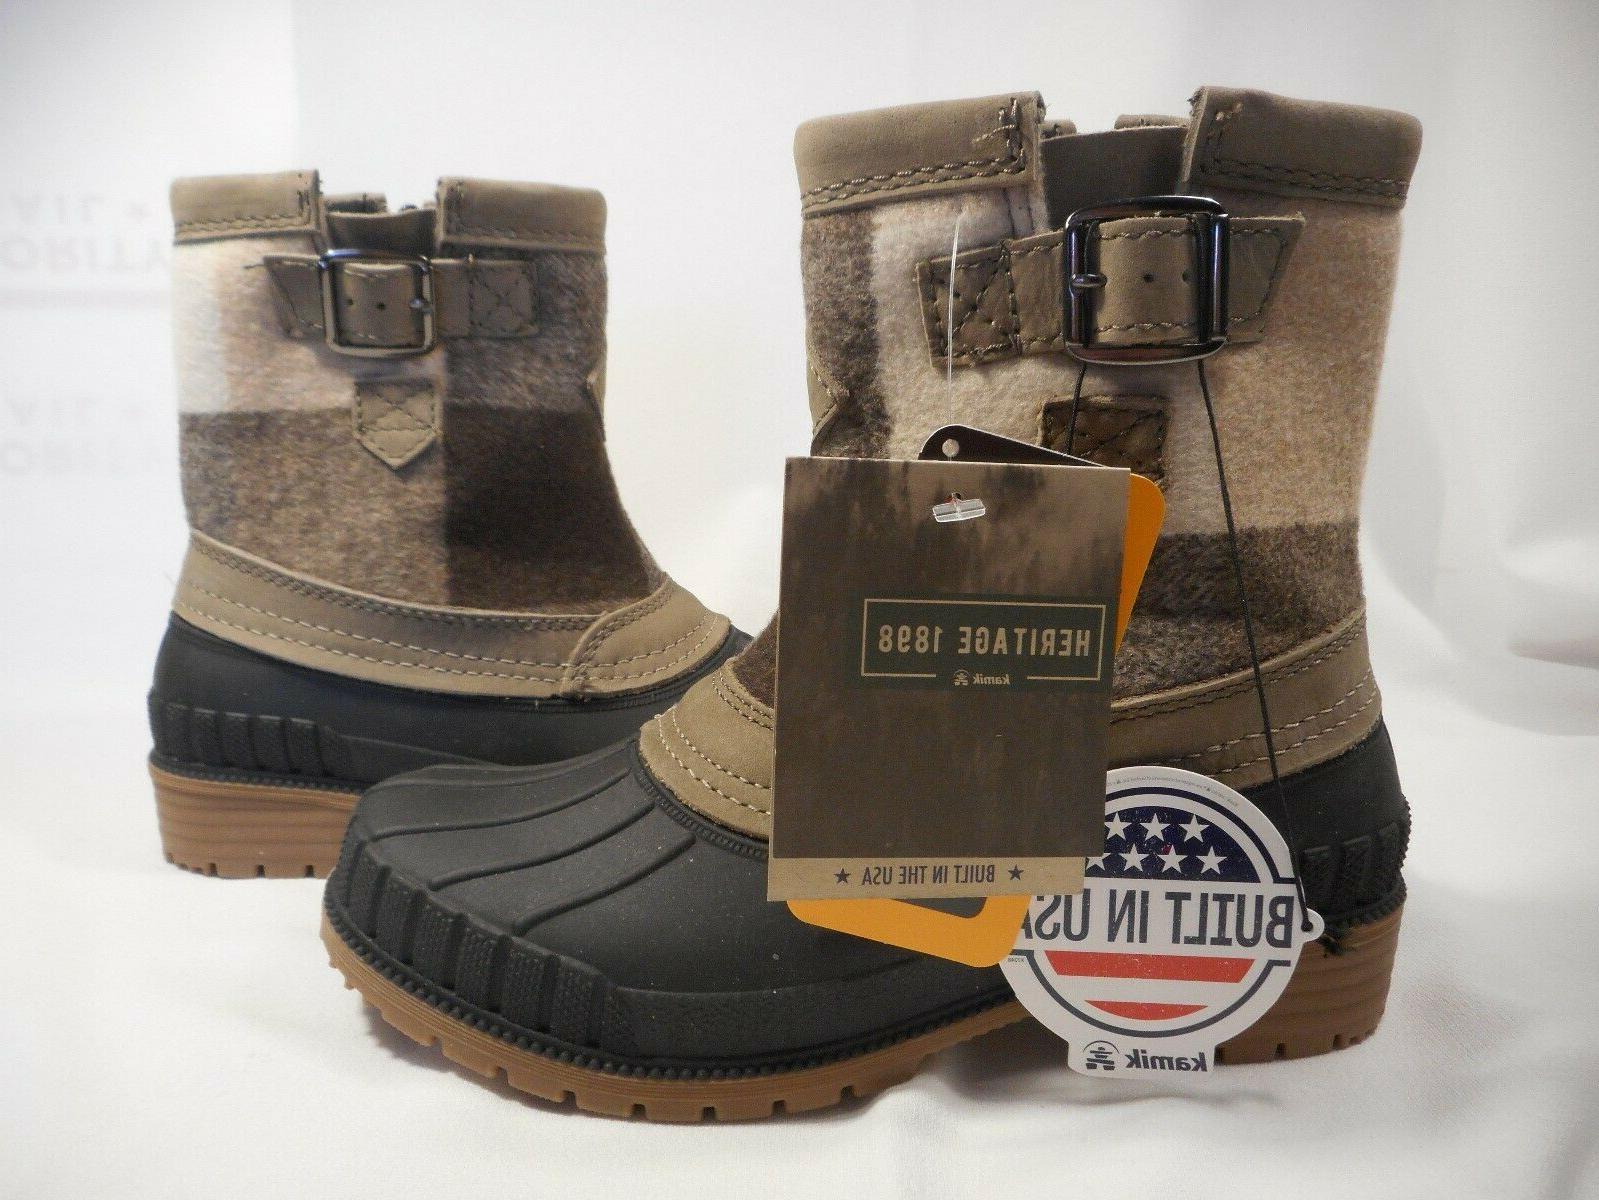 Kamik Women's Boots Waterproof 7 Rt. $110